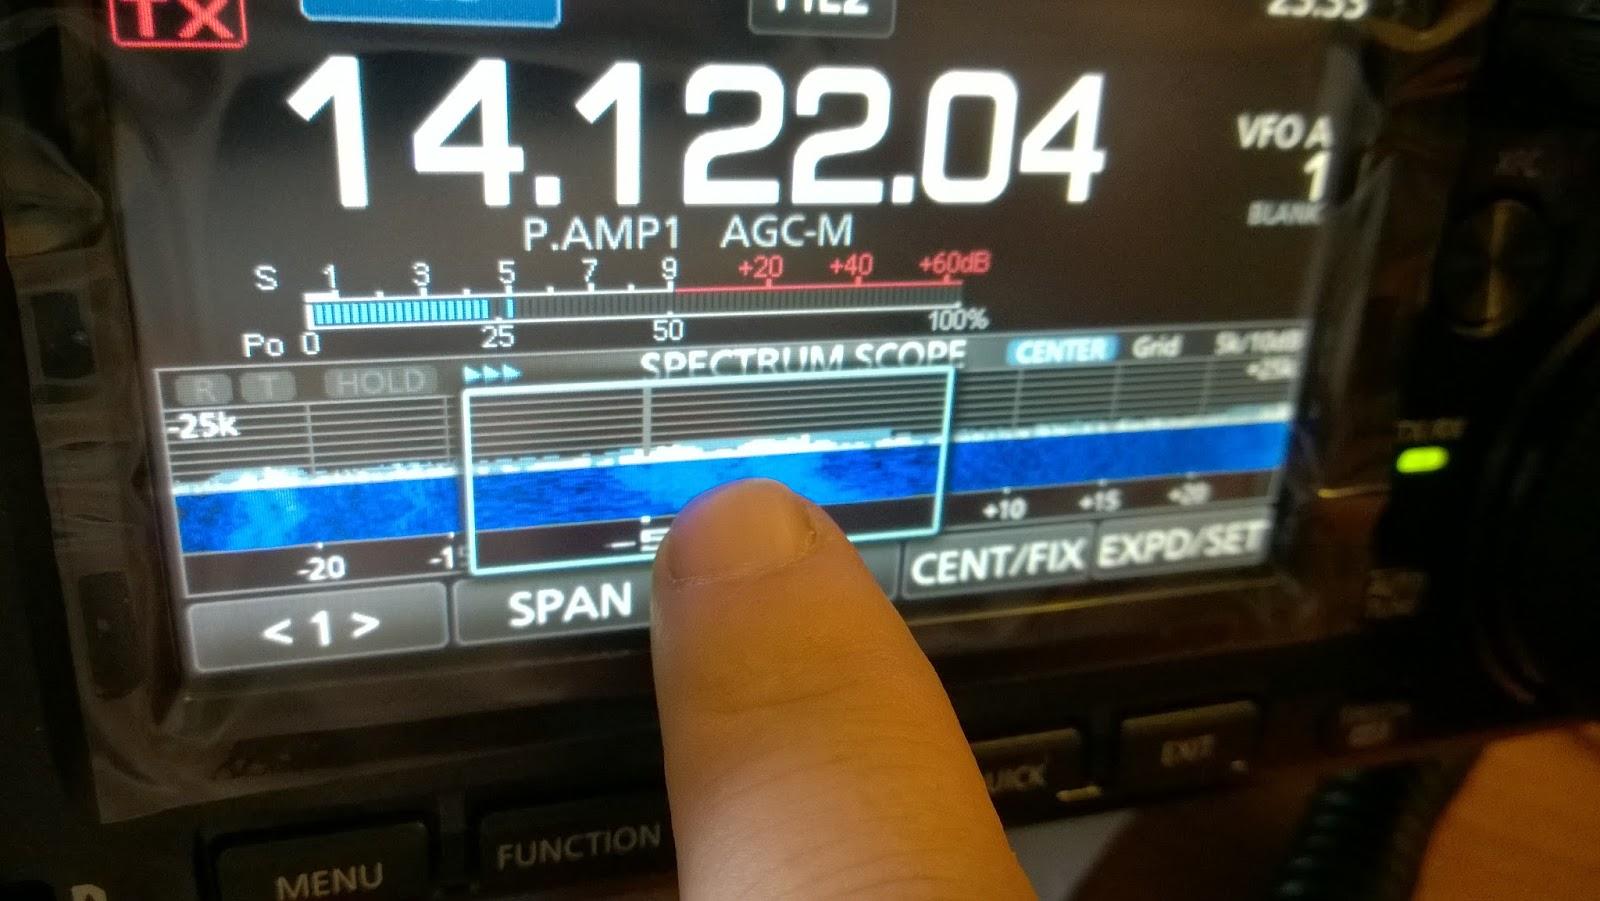 Yo3hjv Aprilie 2016 Vk6wia News Broadcast Transceiver Circuits Punerea In Functiune